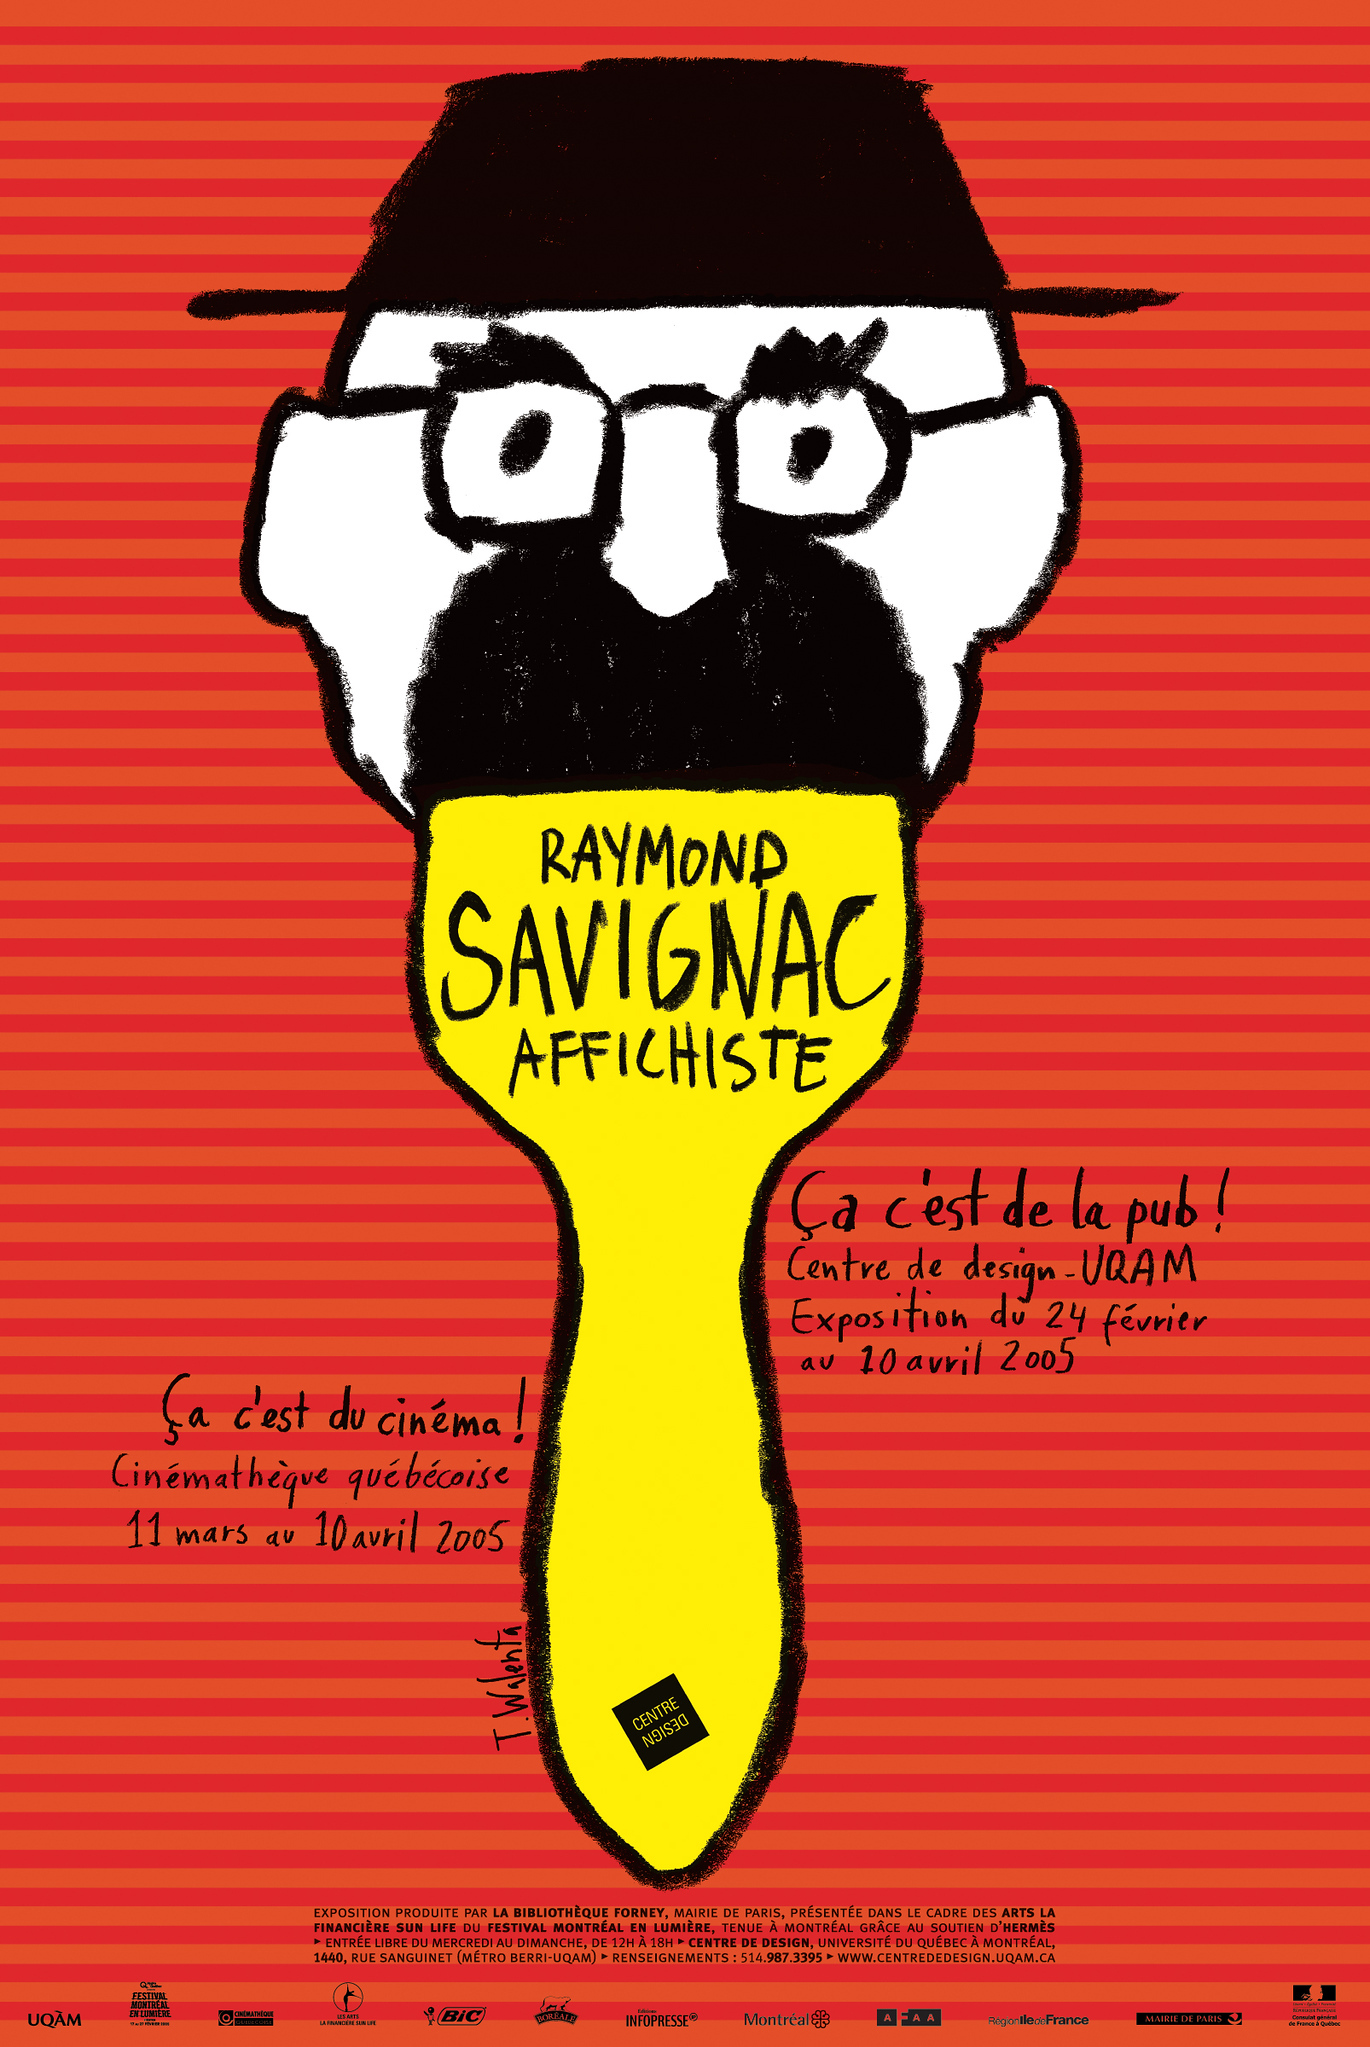 2004 - Exposition - Raymond Savignac affichiste Ça c'est de la pub ©Tomasz Walenta